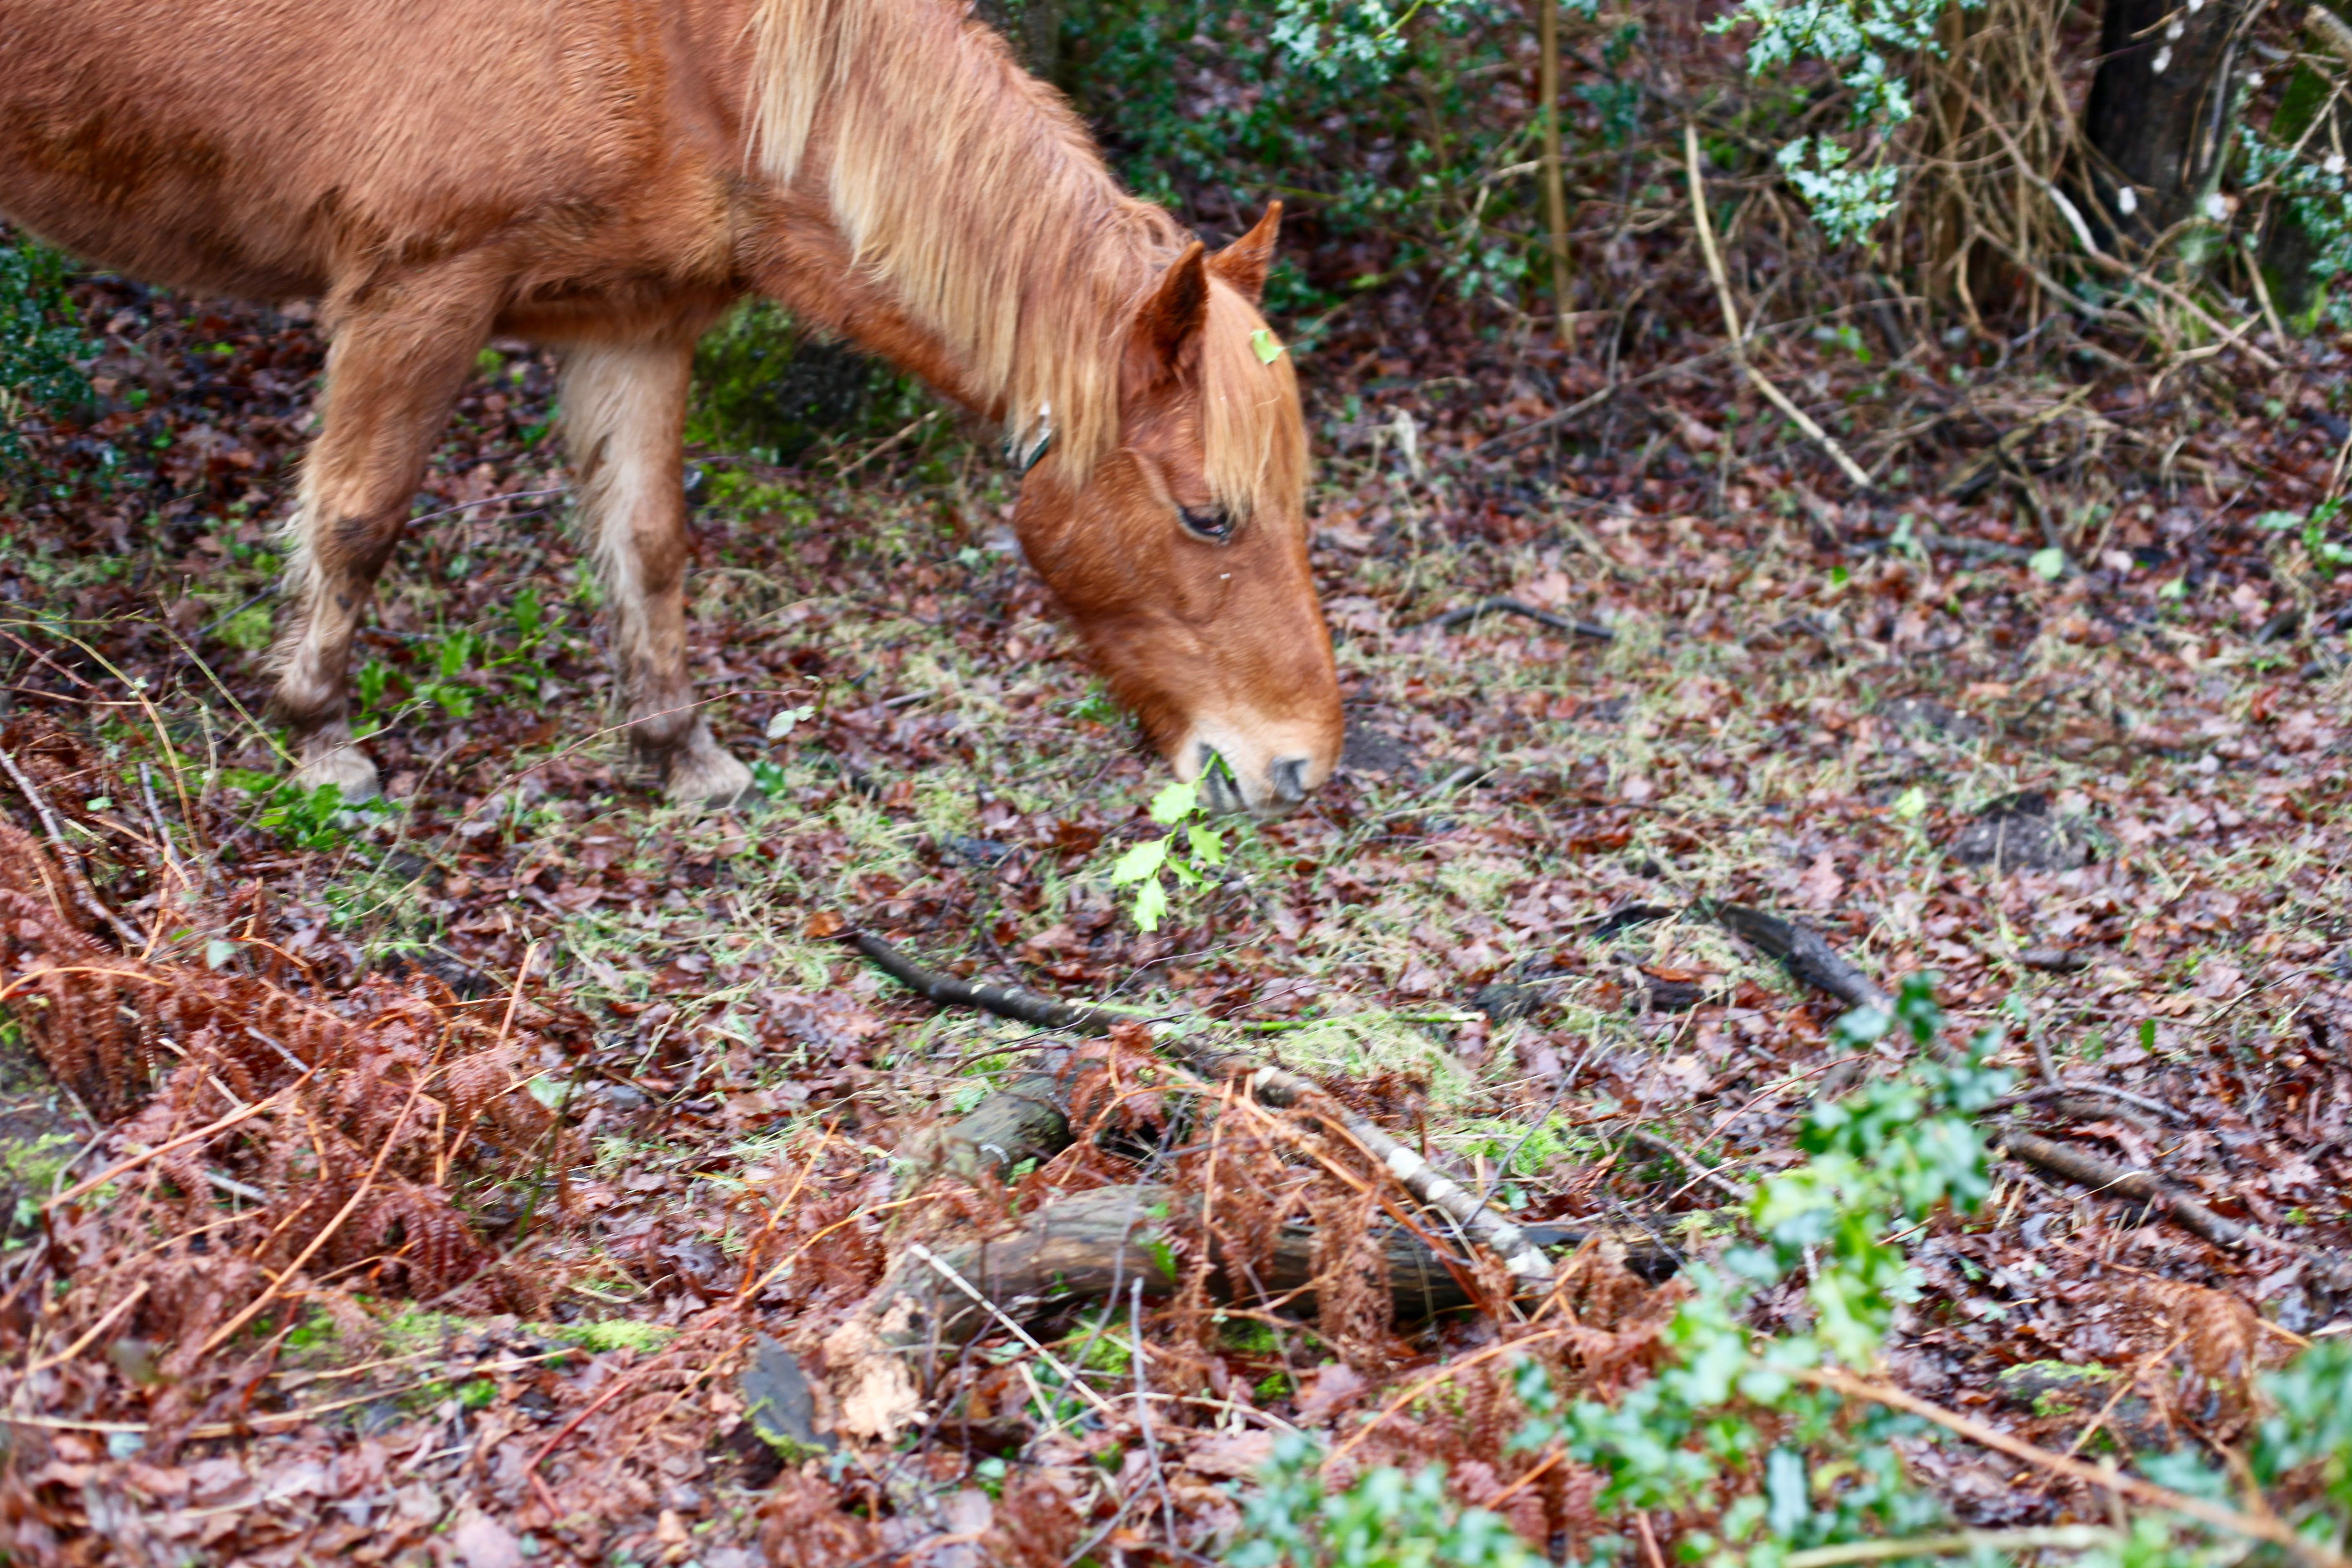 Pony eating holly 2